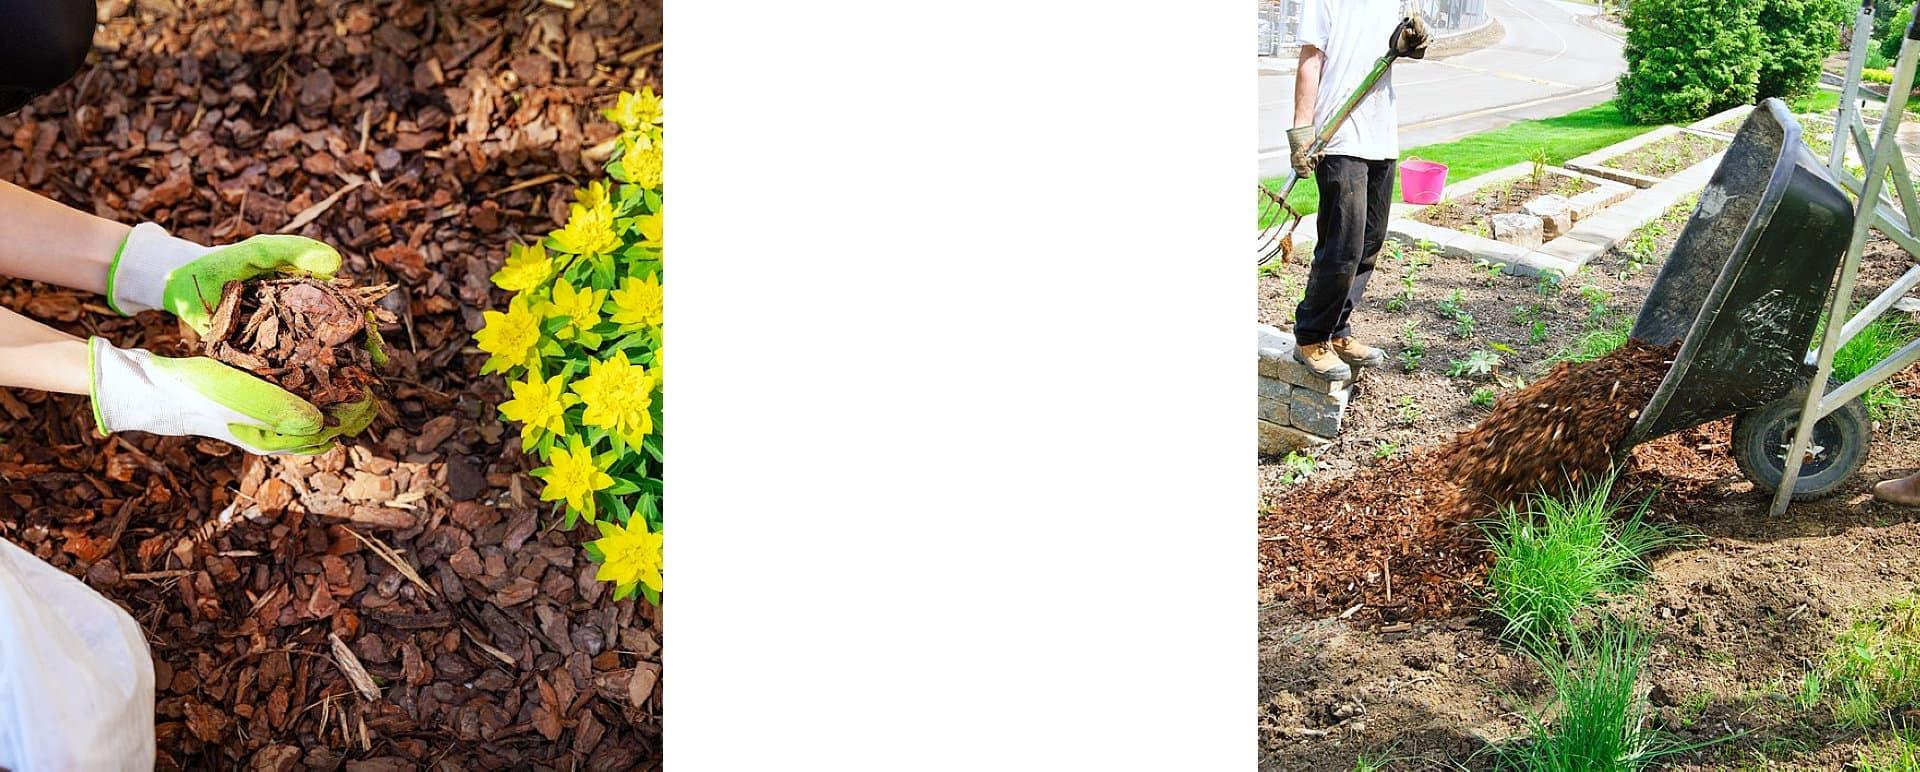 gardener mulching flower bed pine tree and barrow load of mulch